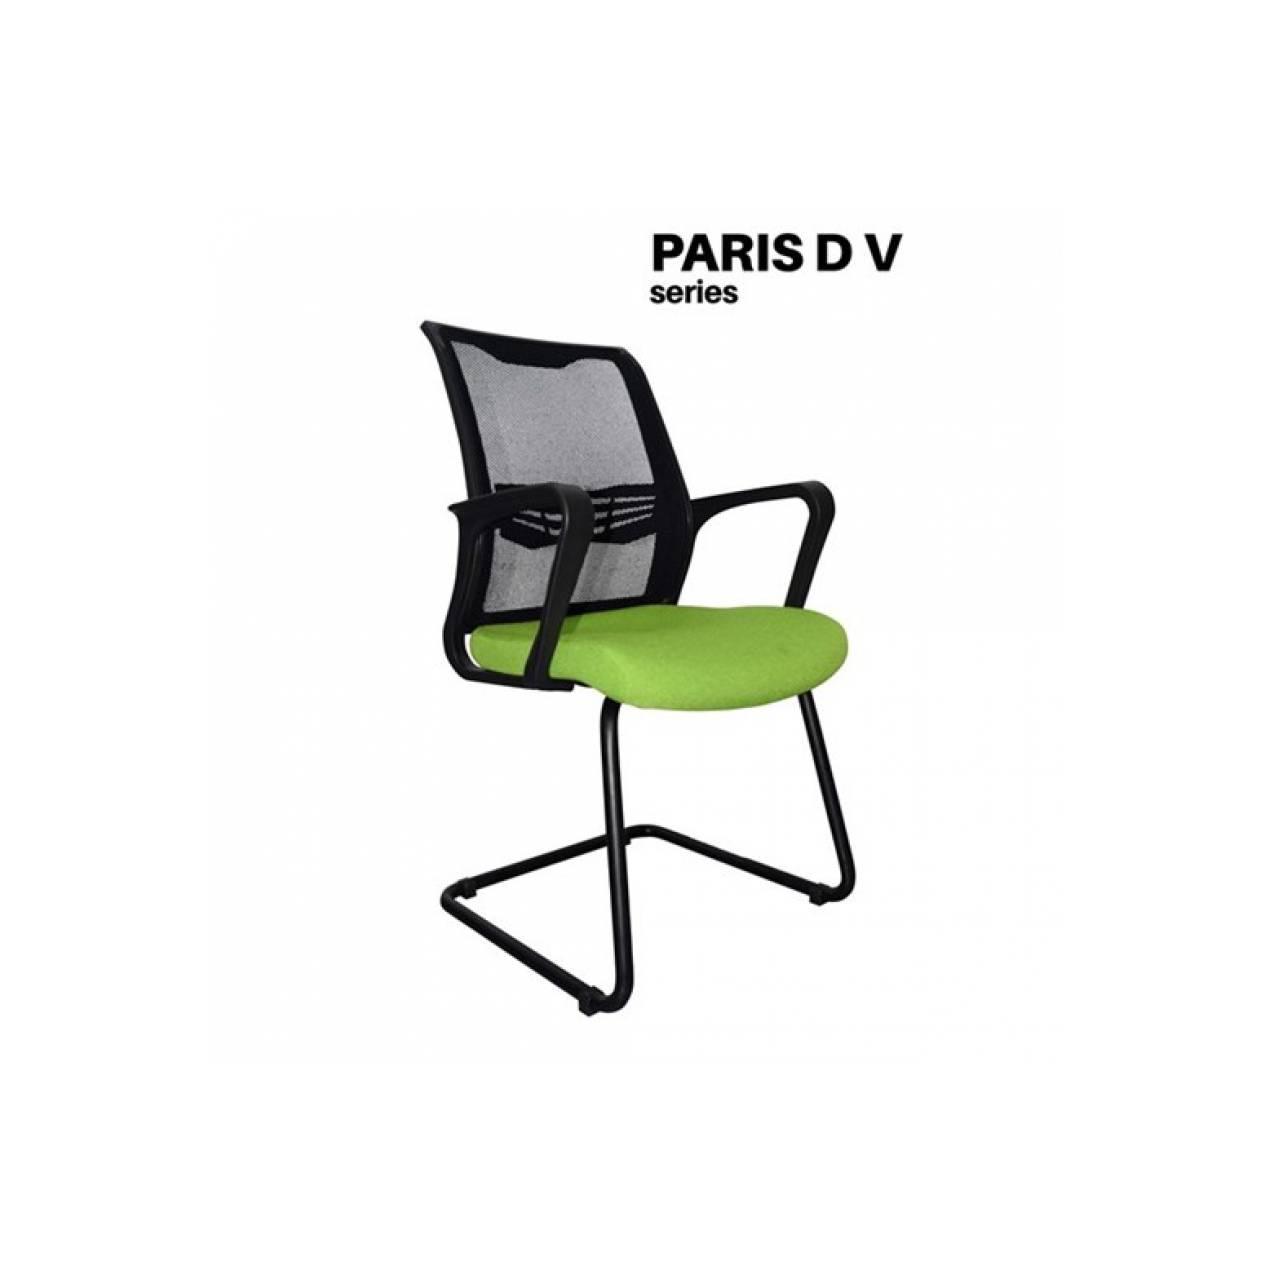 Kursi Hadap Kantor Murah UNO PARIS DV